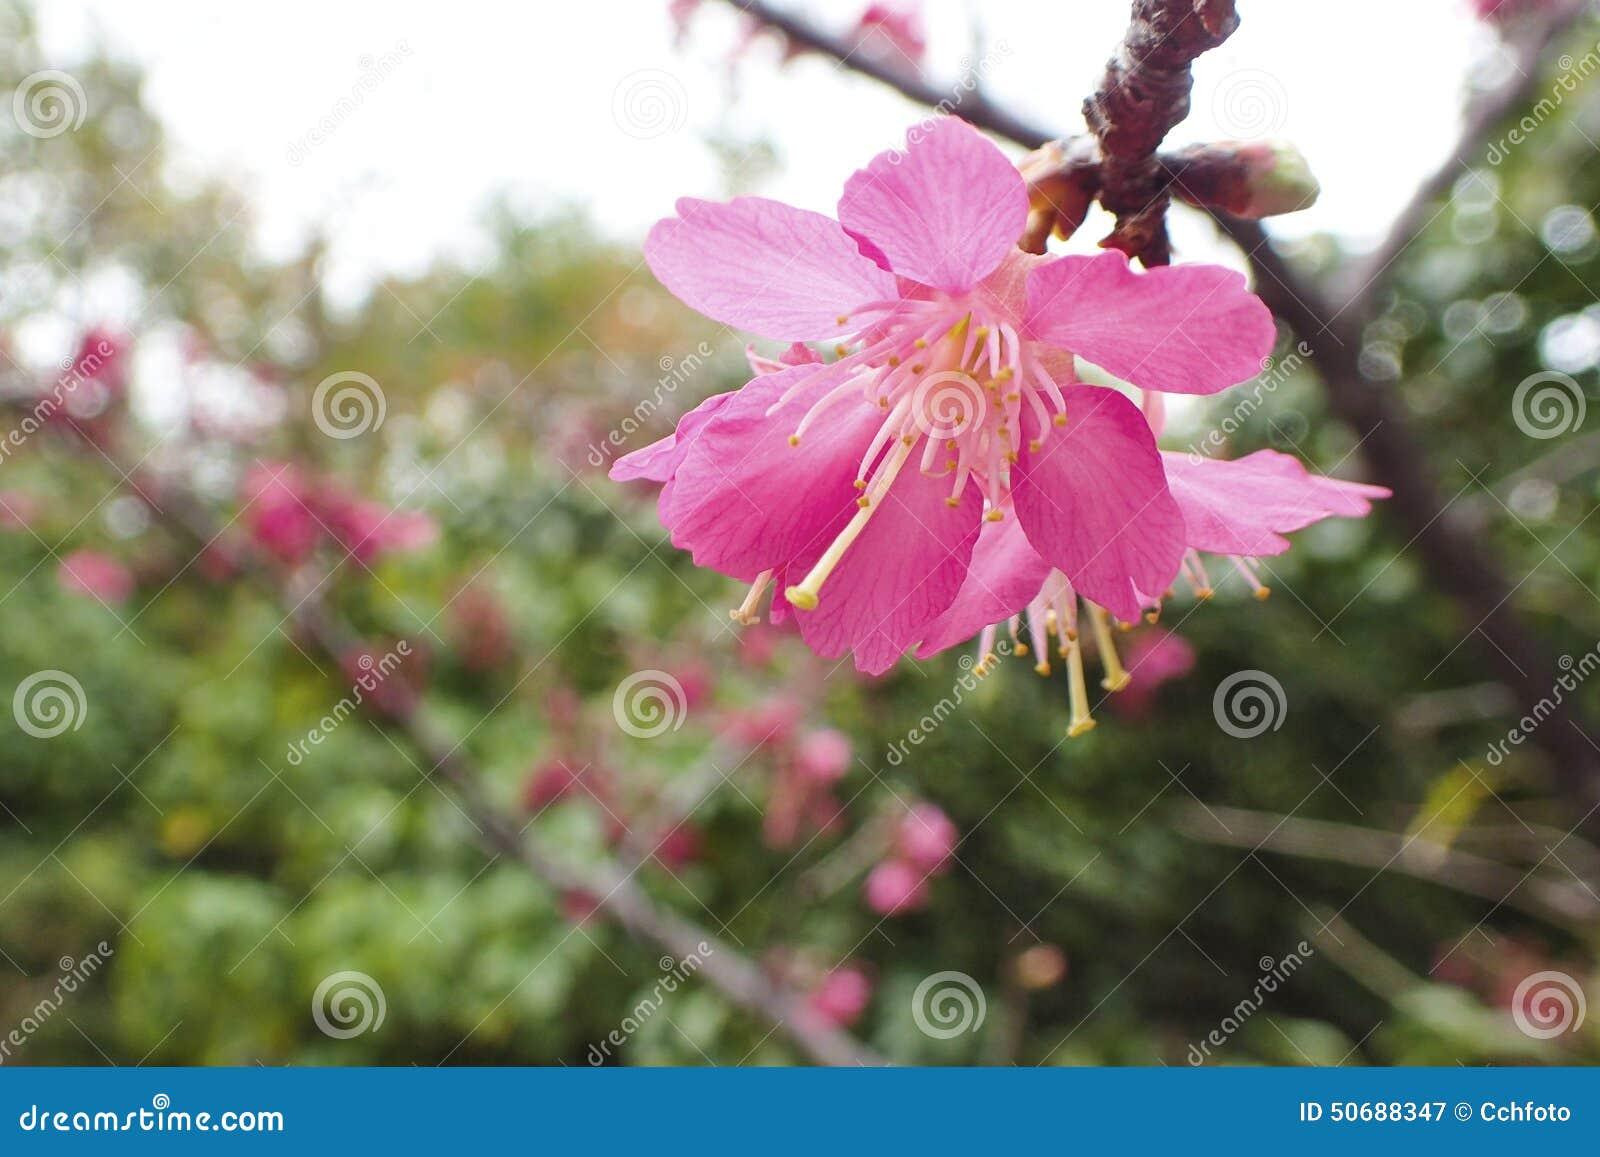 Download 樱花花 库存图片. 图片 包括有 绿色, 红色, 樱桃, 植物群, 日语, 春天, 开花, 日本, 季节 - 50688347